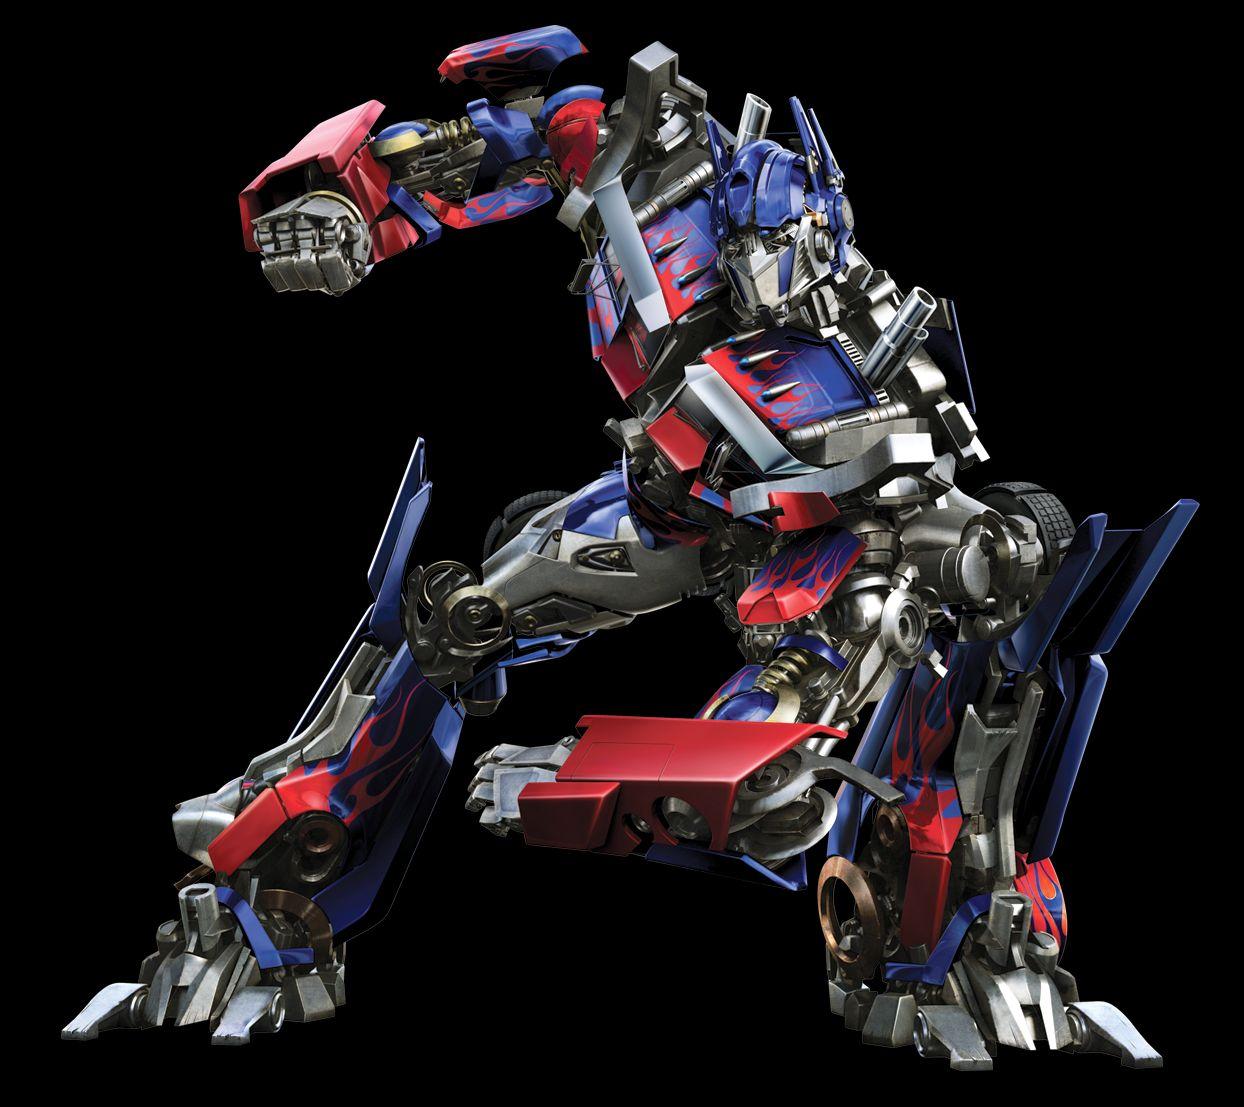 Clipart ruler gambar. Transformers png transparent free